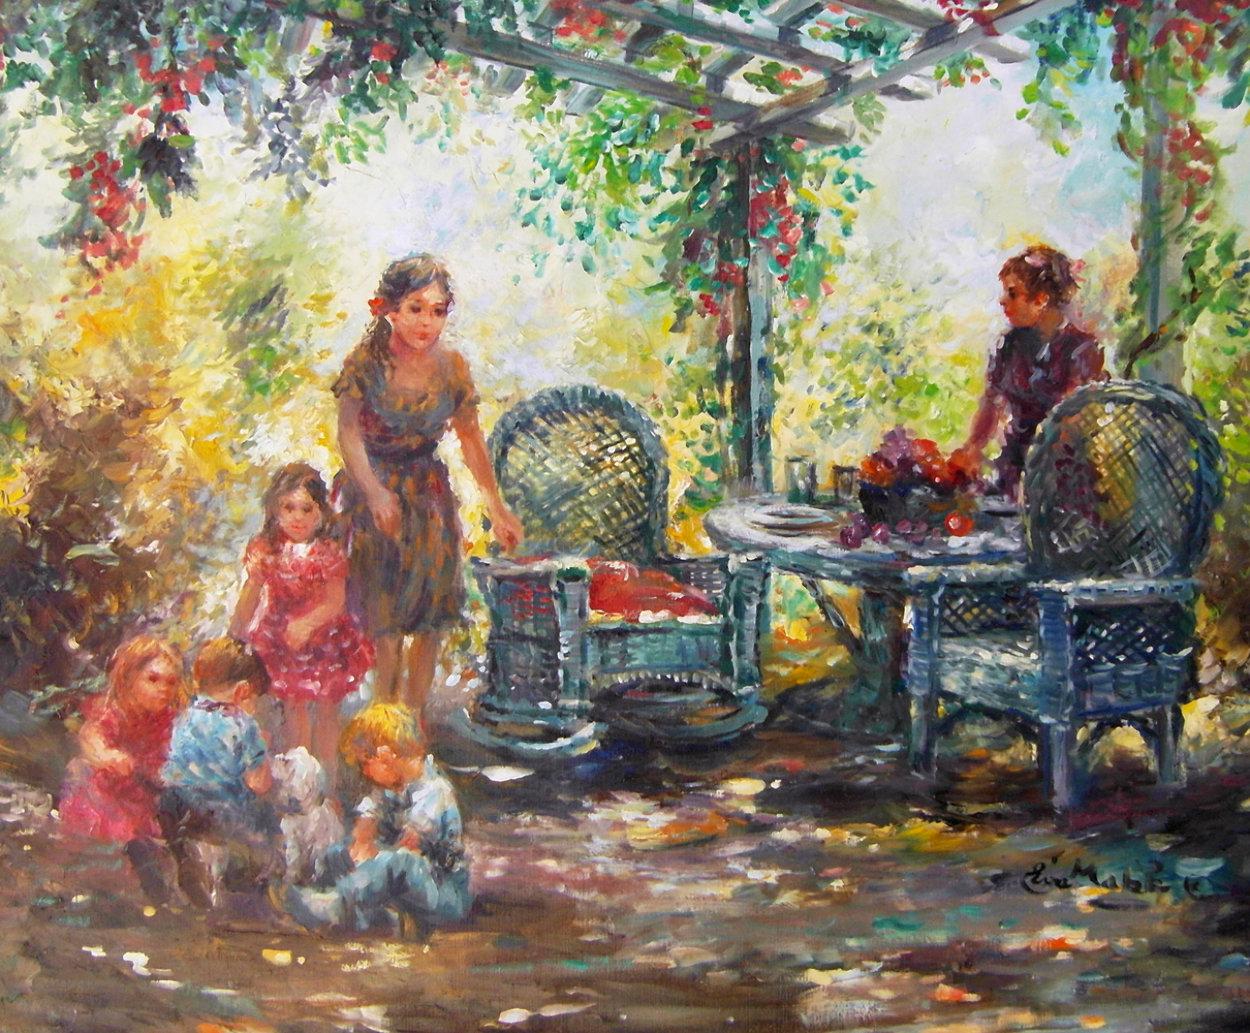 Rocking Chair 41x35 Super Huge Original Painting by Eva Makk